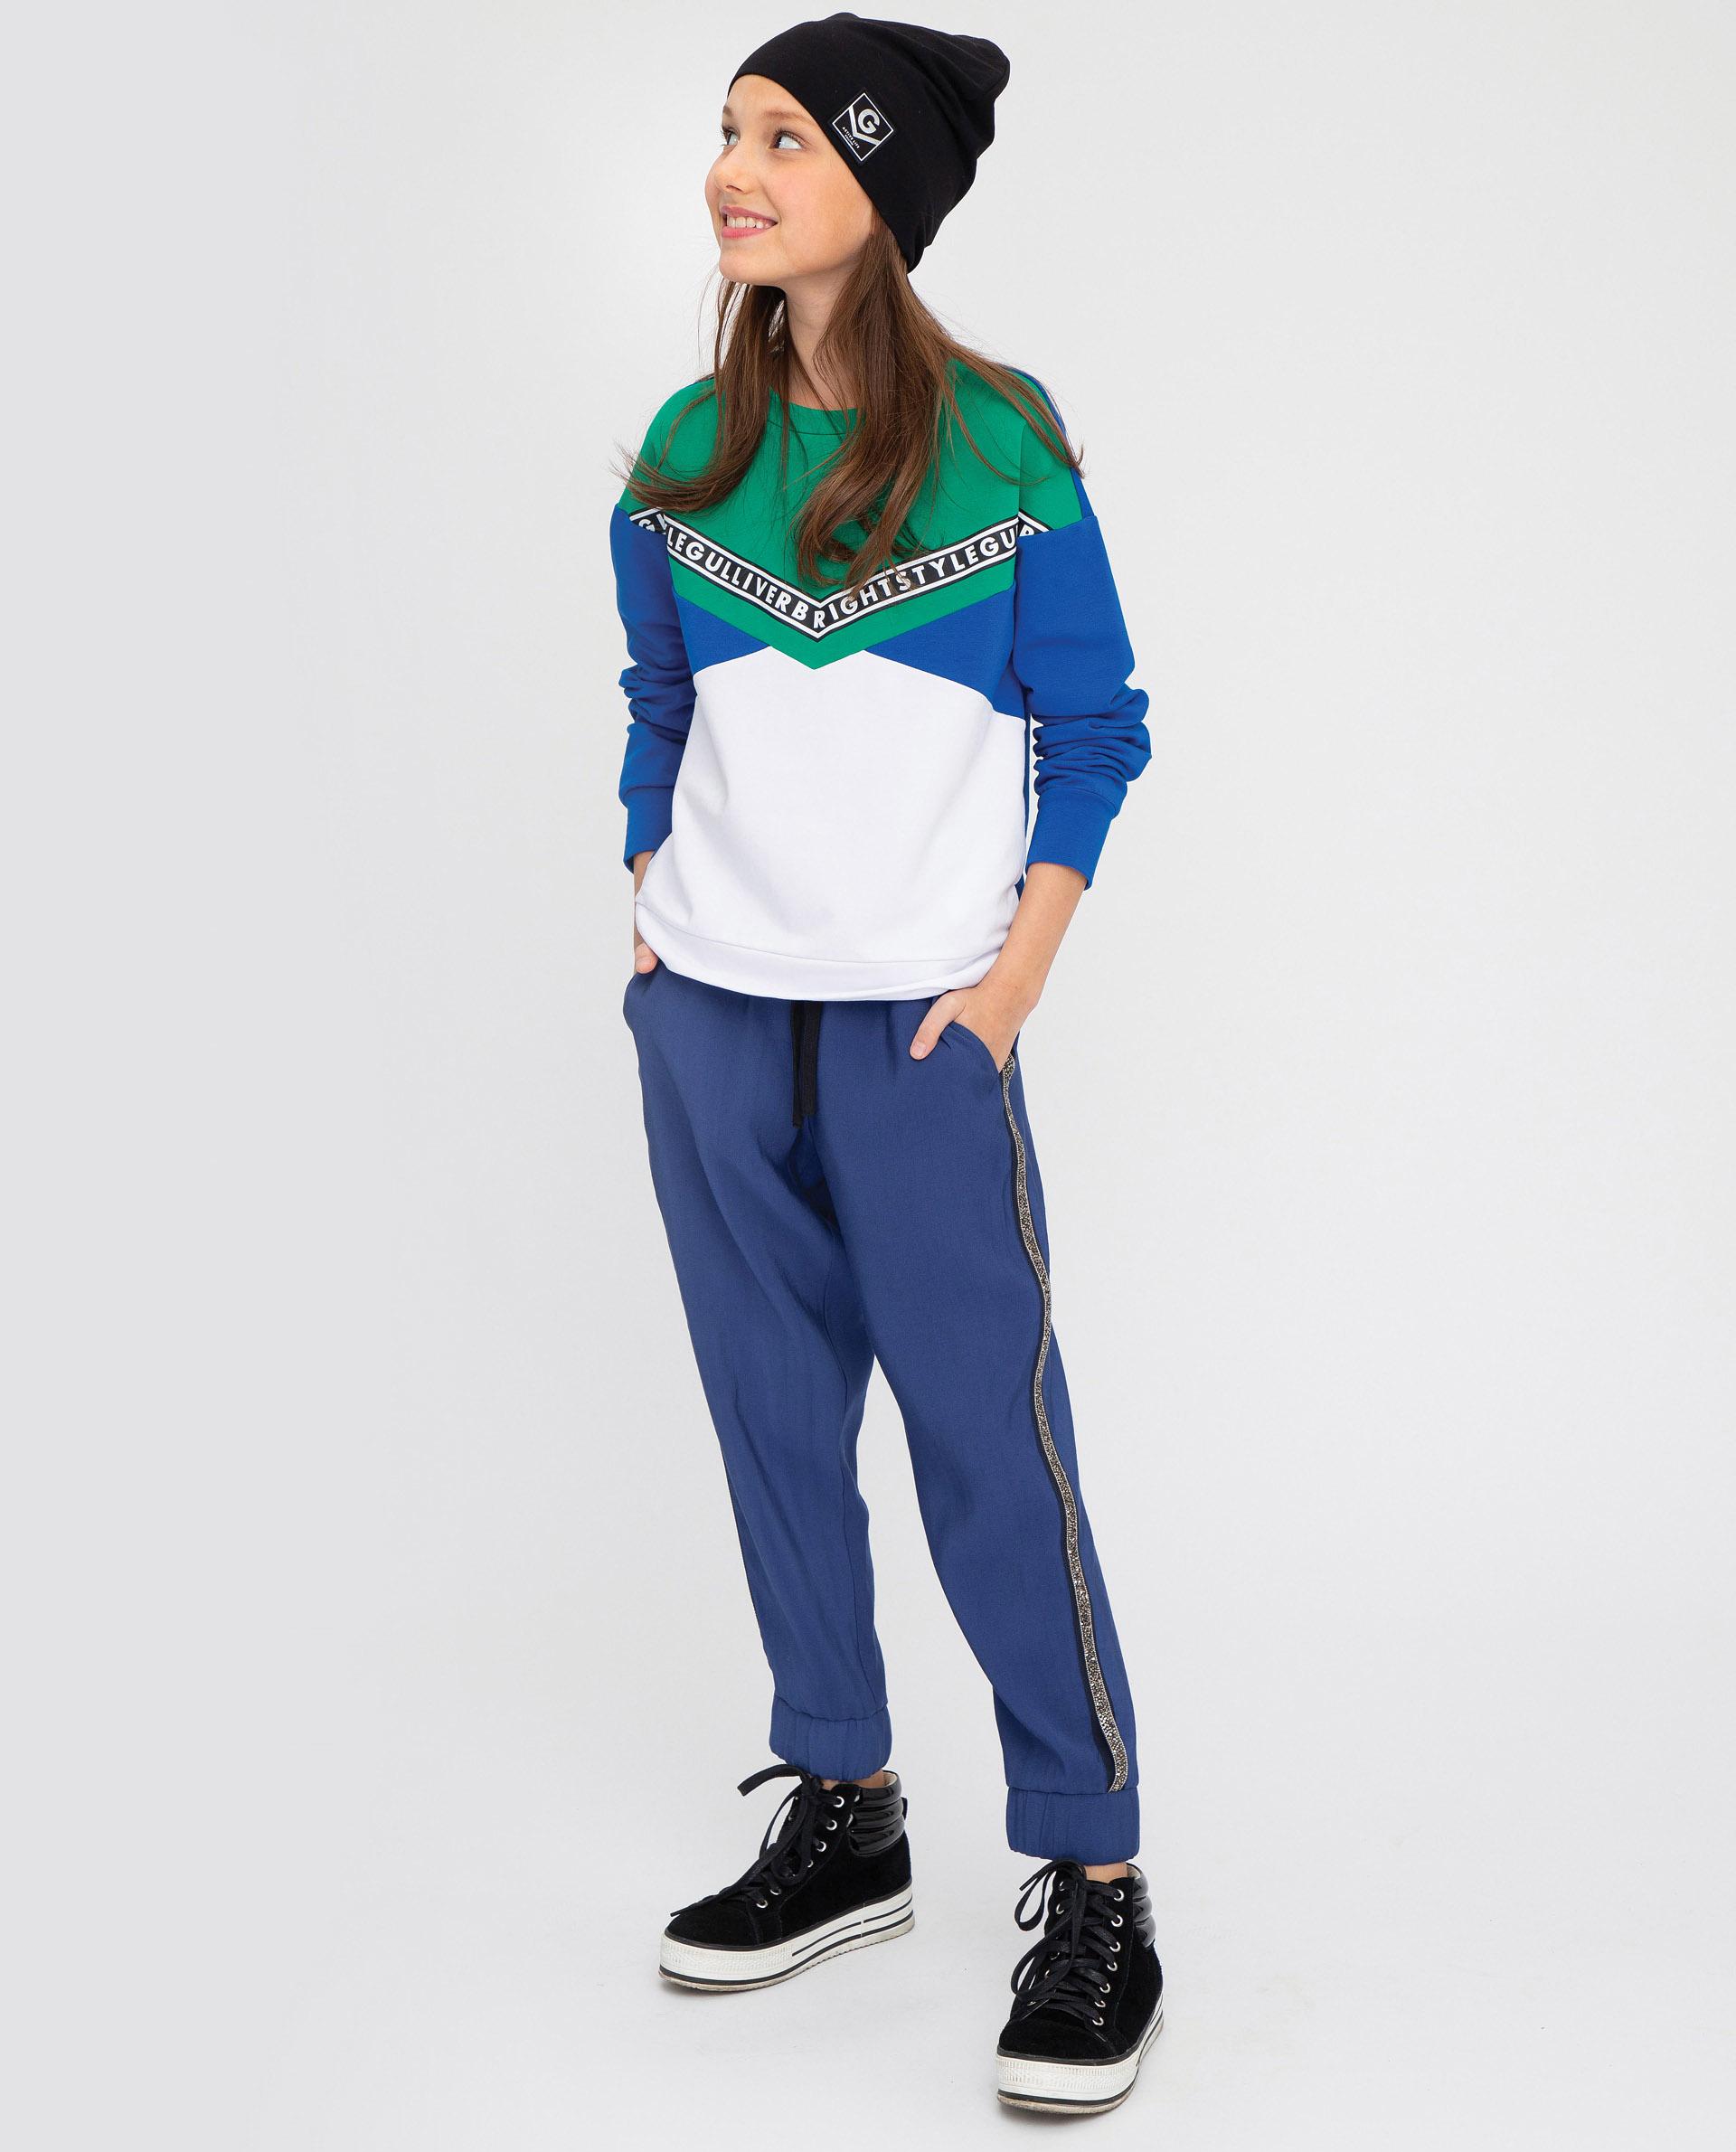 Купить 12009GJC6304, Синие брюки Gulliver, синий, 146, Женский, ВЕСНА/ЛЕТО 2020 (shop: GulliverMarket Gulliver Market)